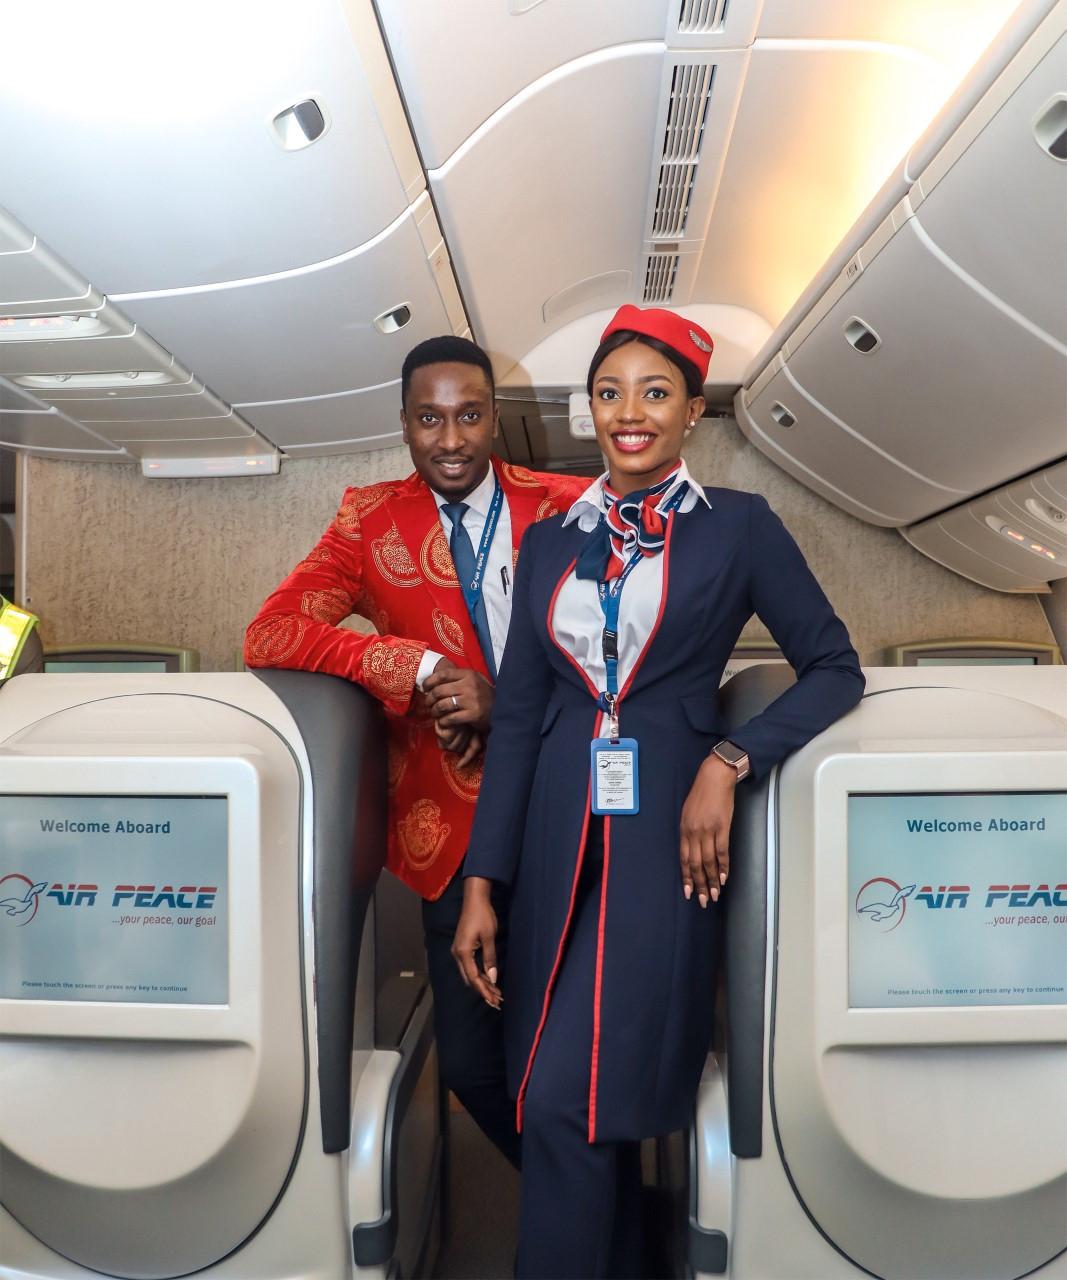 Enjoy Top-notch Hospitality on Air Peaces Nonstop Johannesburg Flights Lindaikejiblog 3